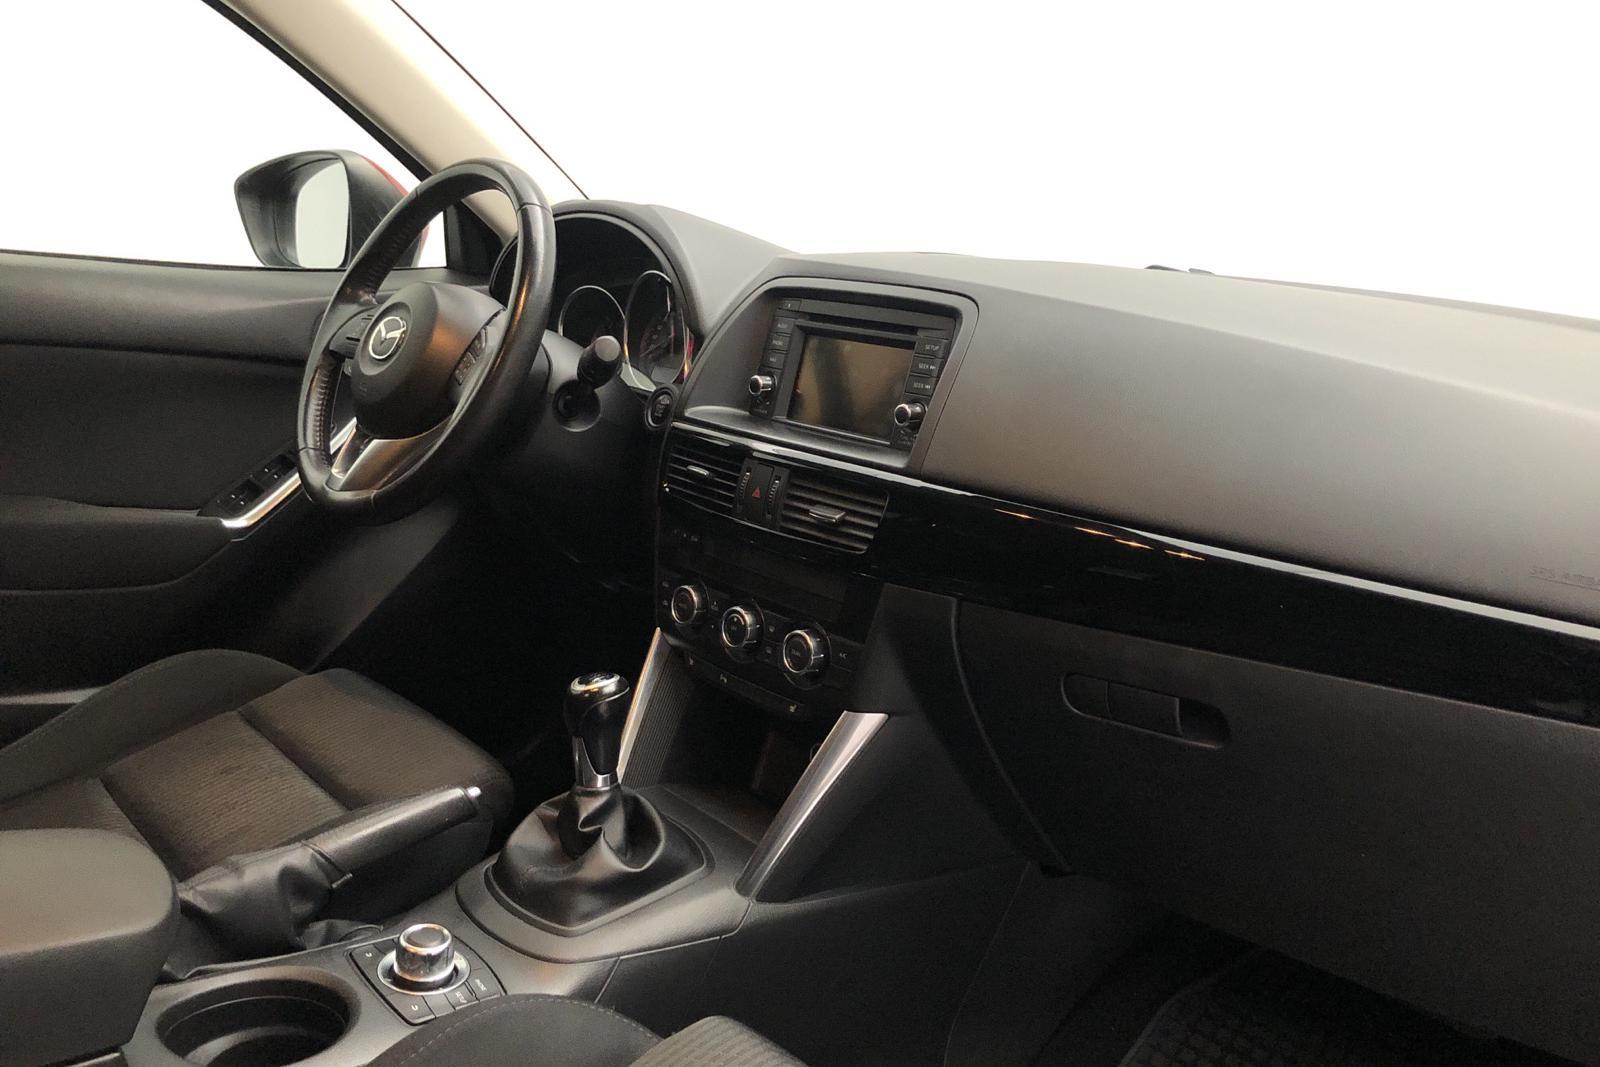 Mazda CX-5 2.2 DE AWD (150hk) - 14 400 mil - Manuell - röd - 2012